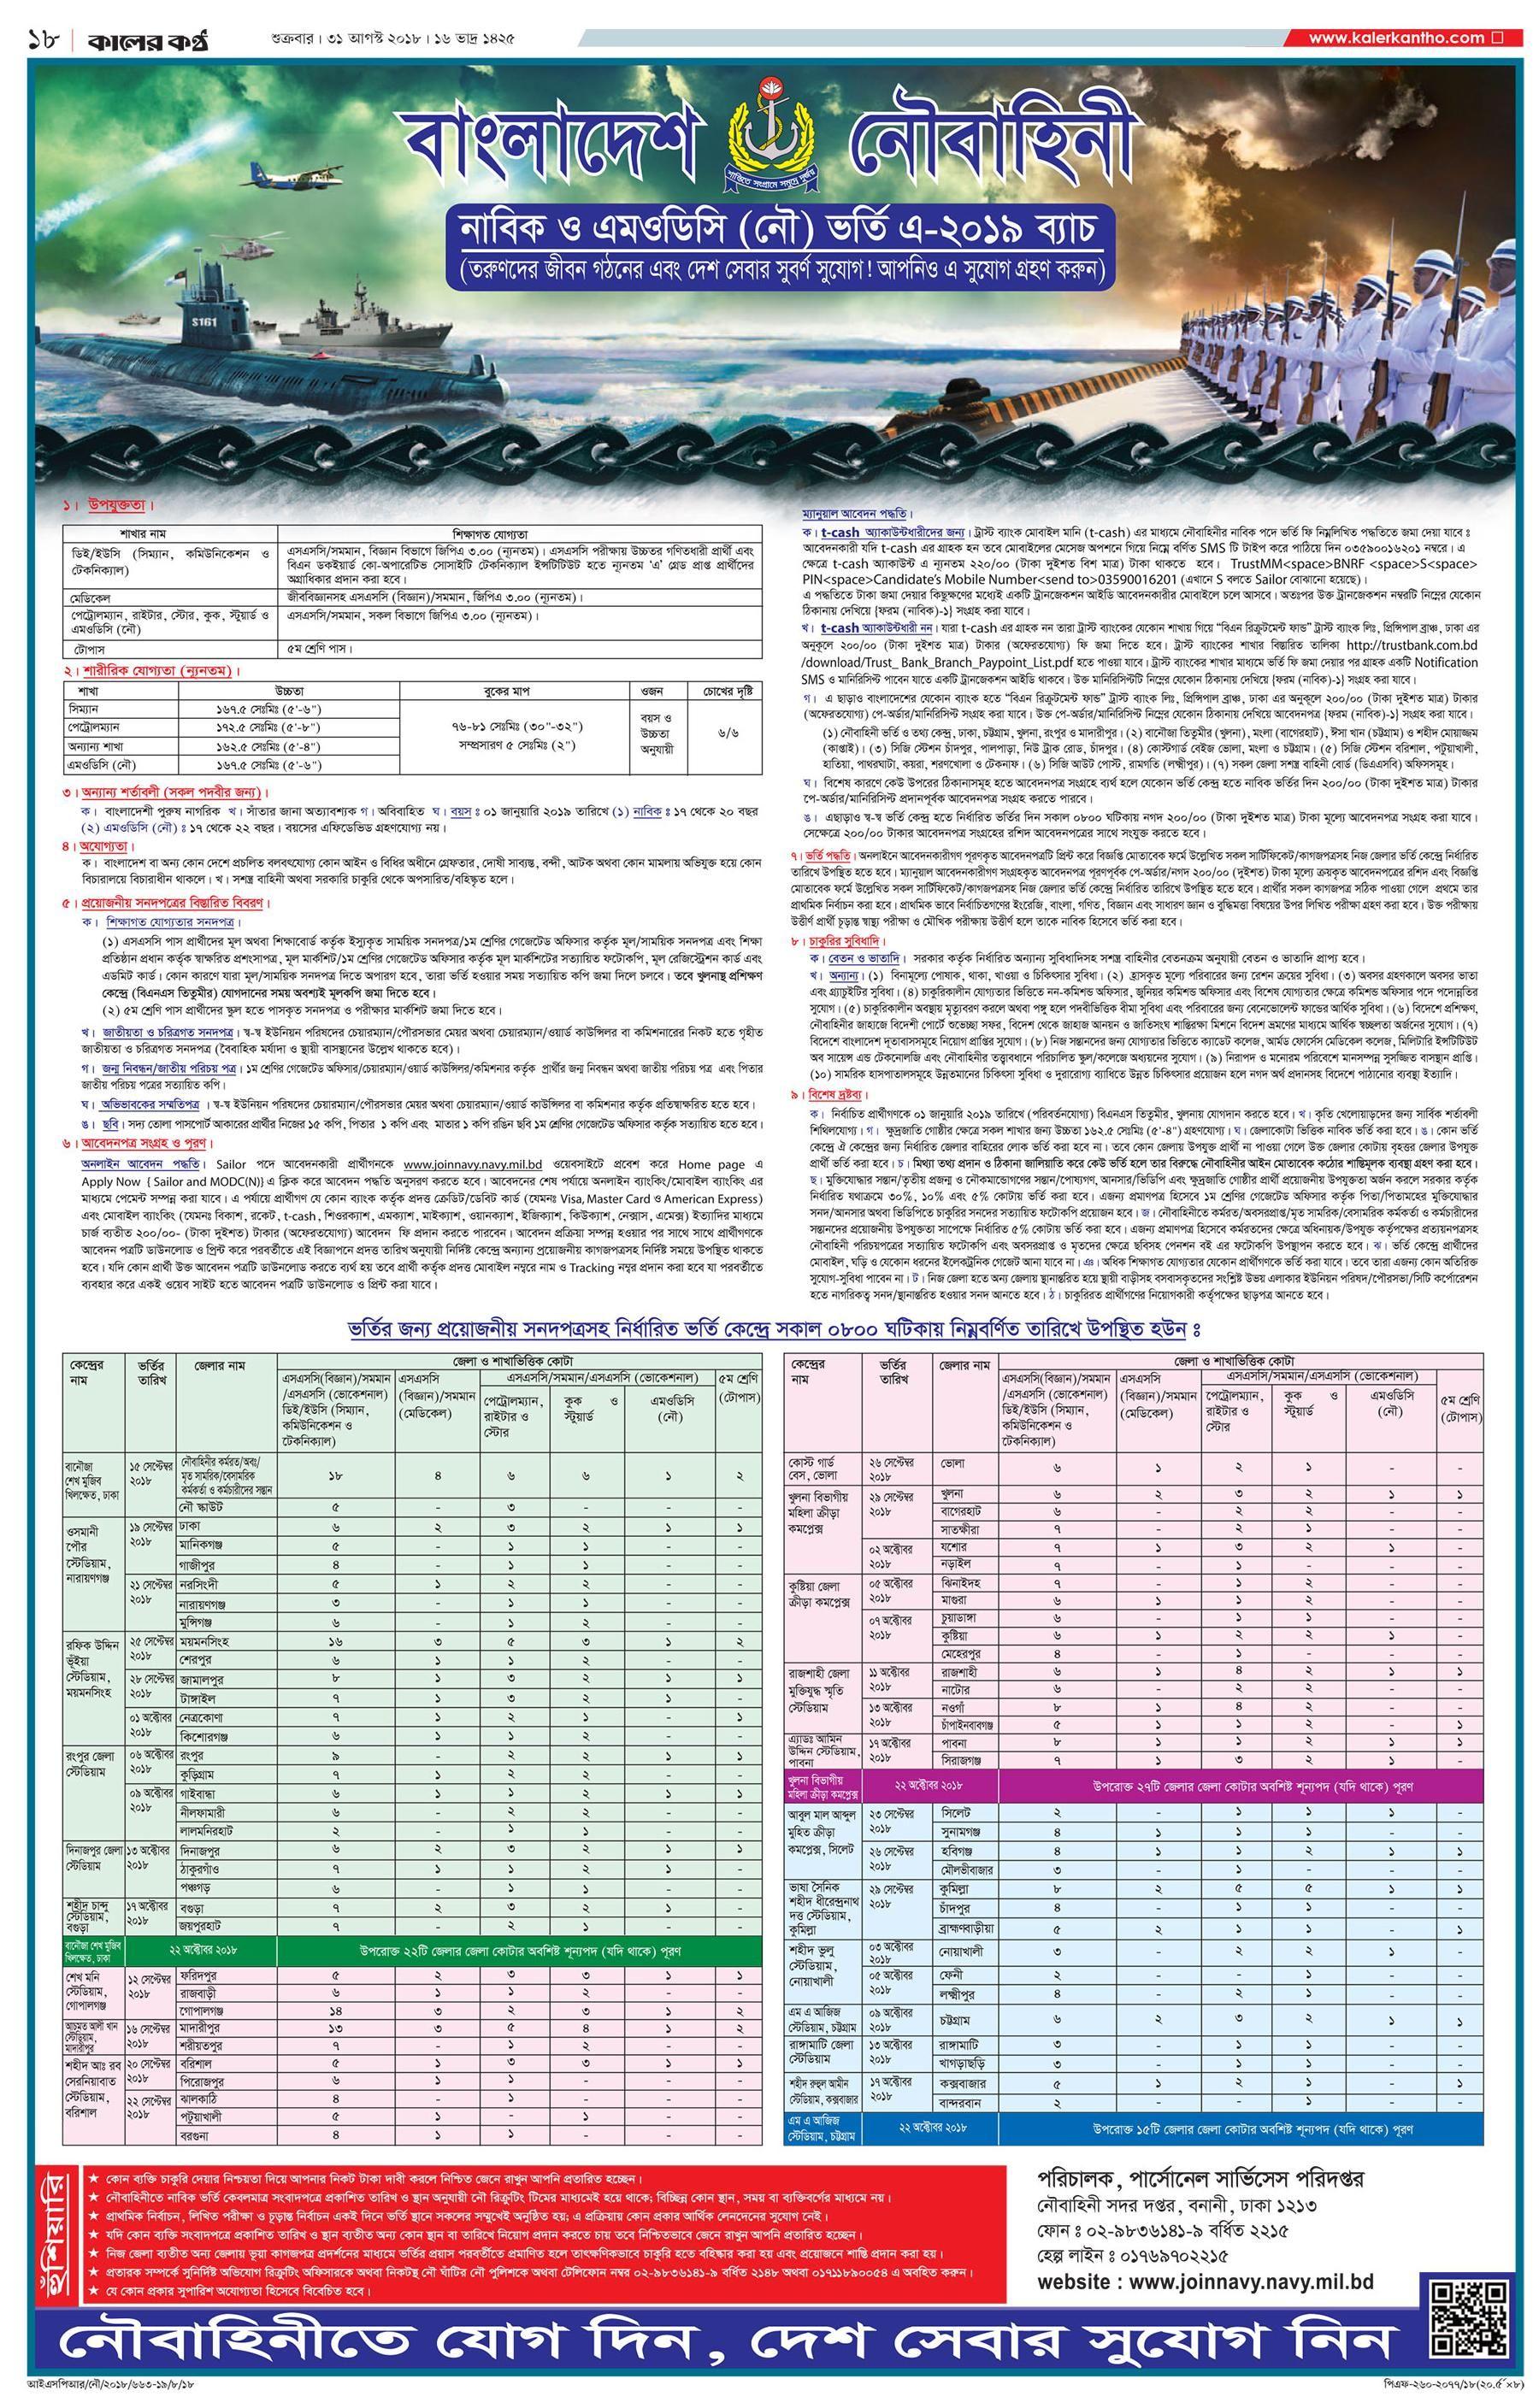 Bangladesh Navy Job Circular Apply & Application Form 2018